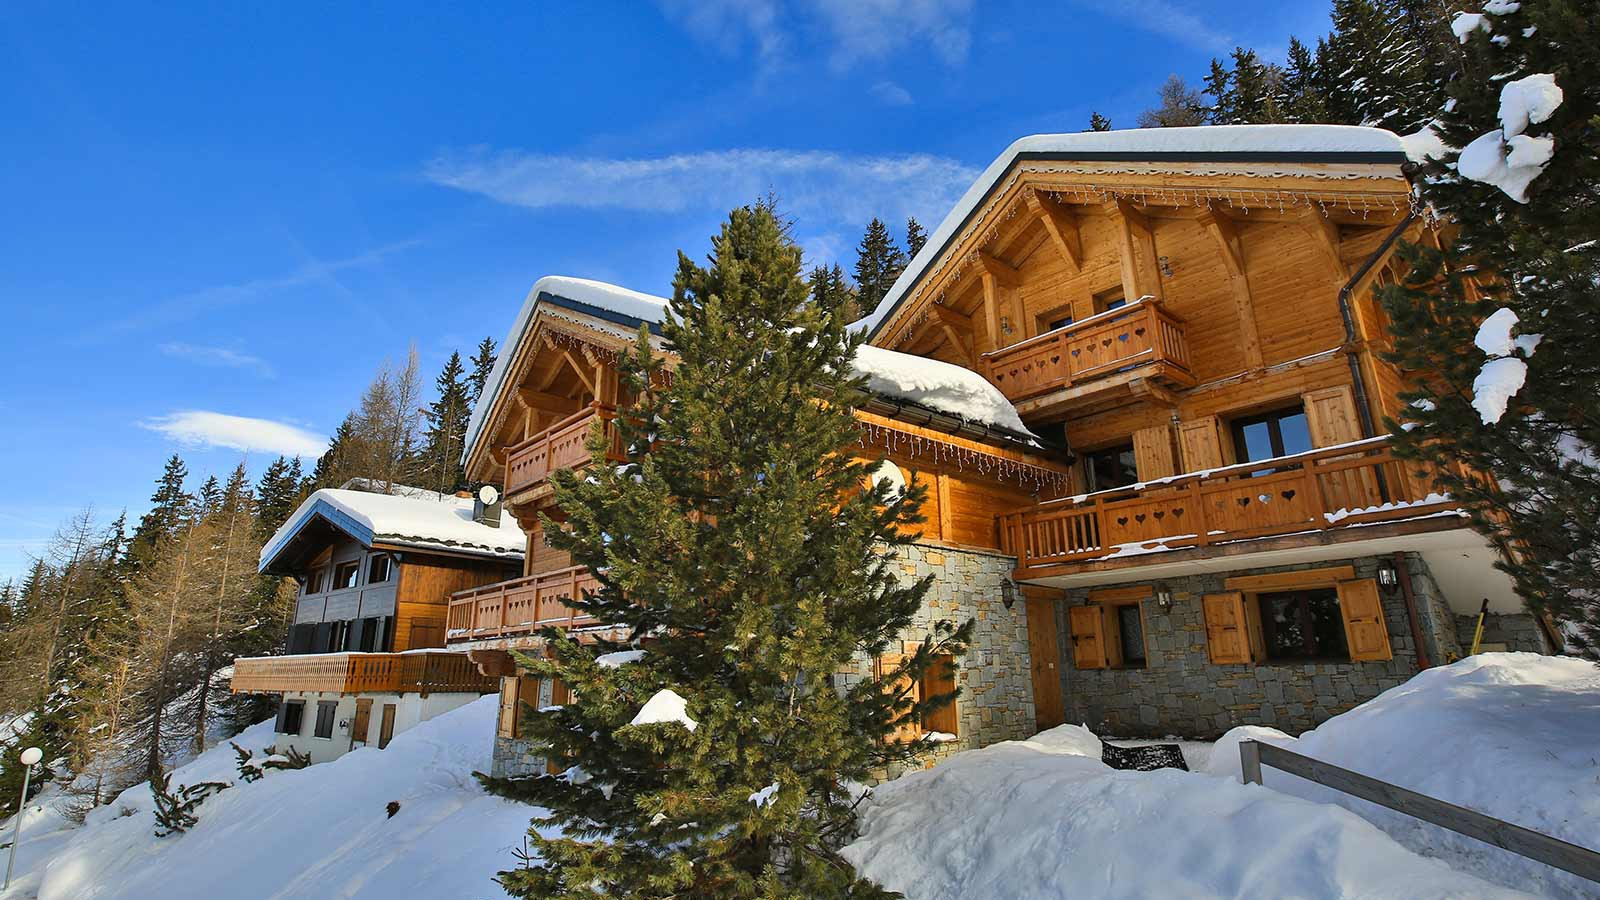 Exterior, Chalet St Moritz - Ski Chalet in La Plagne, France